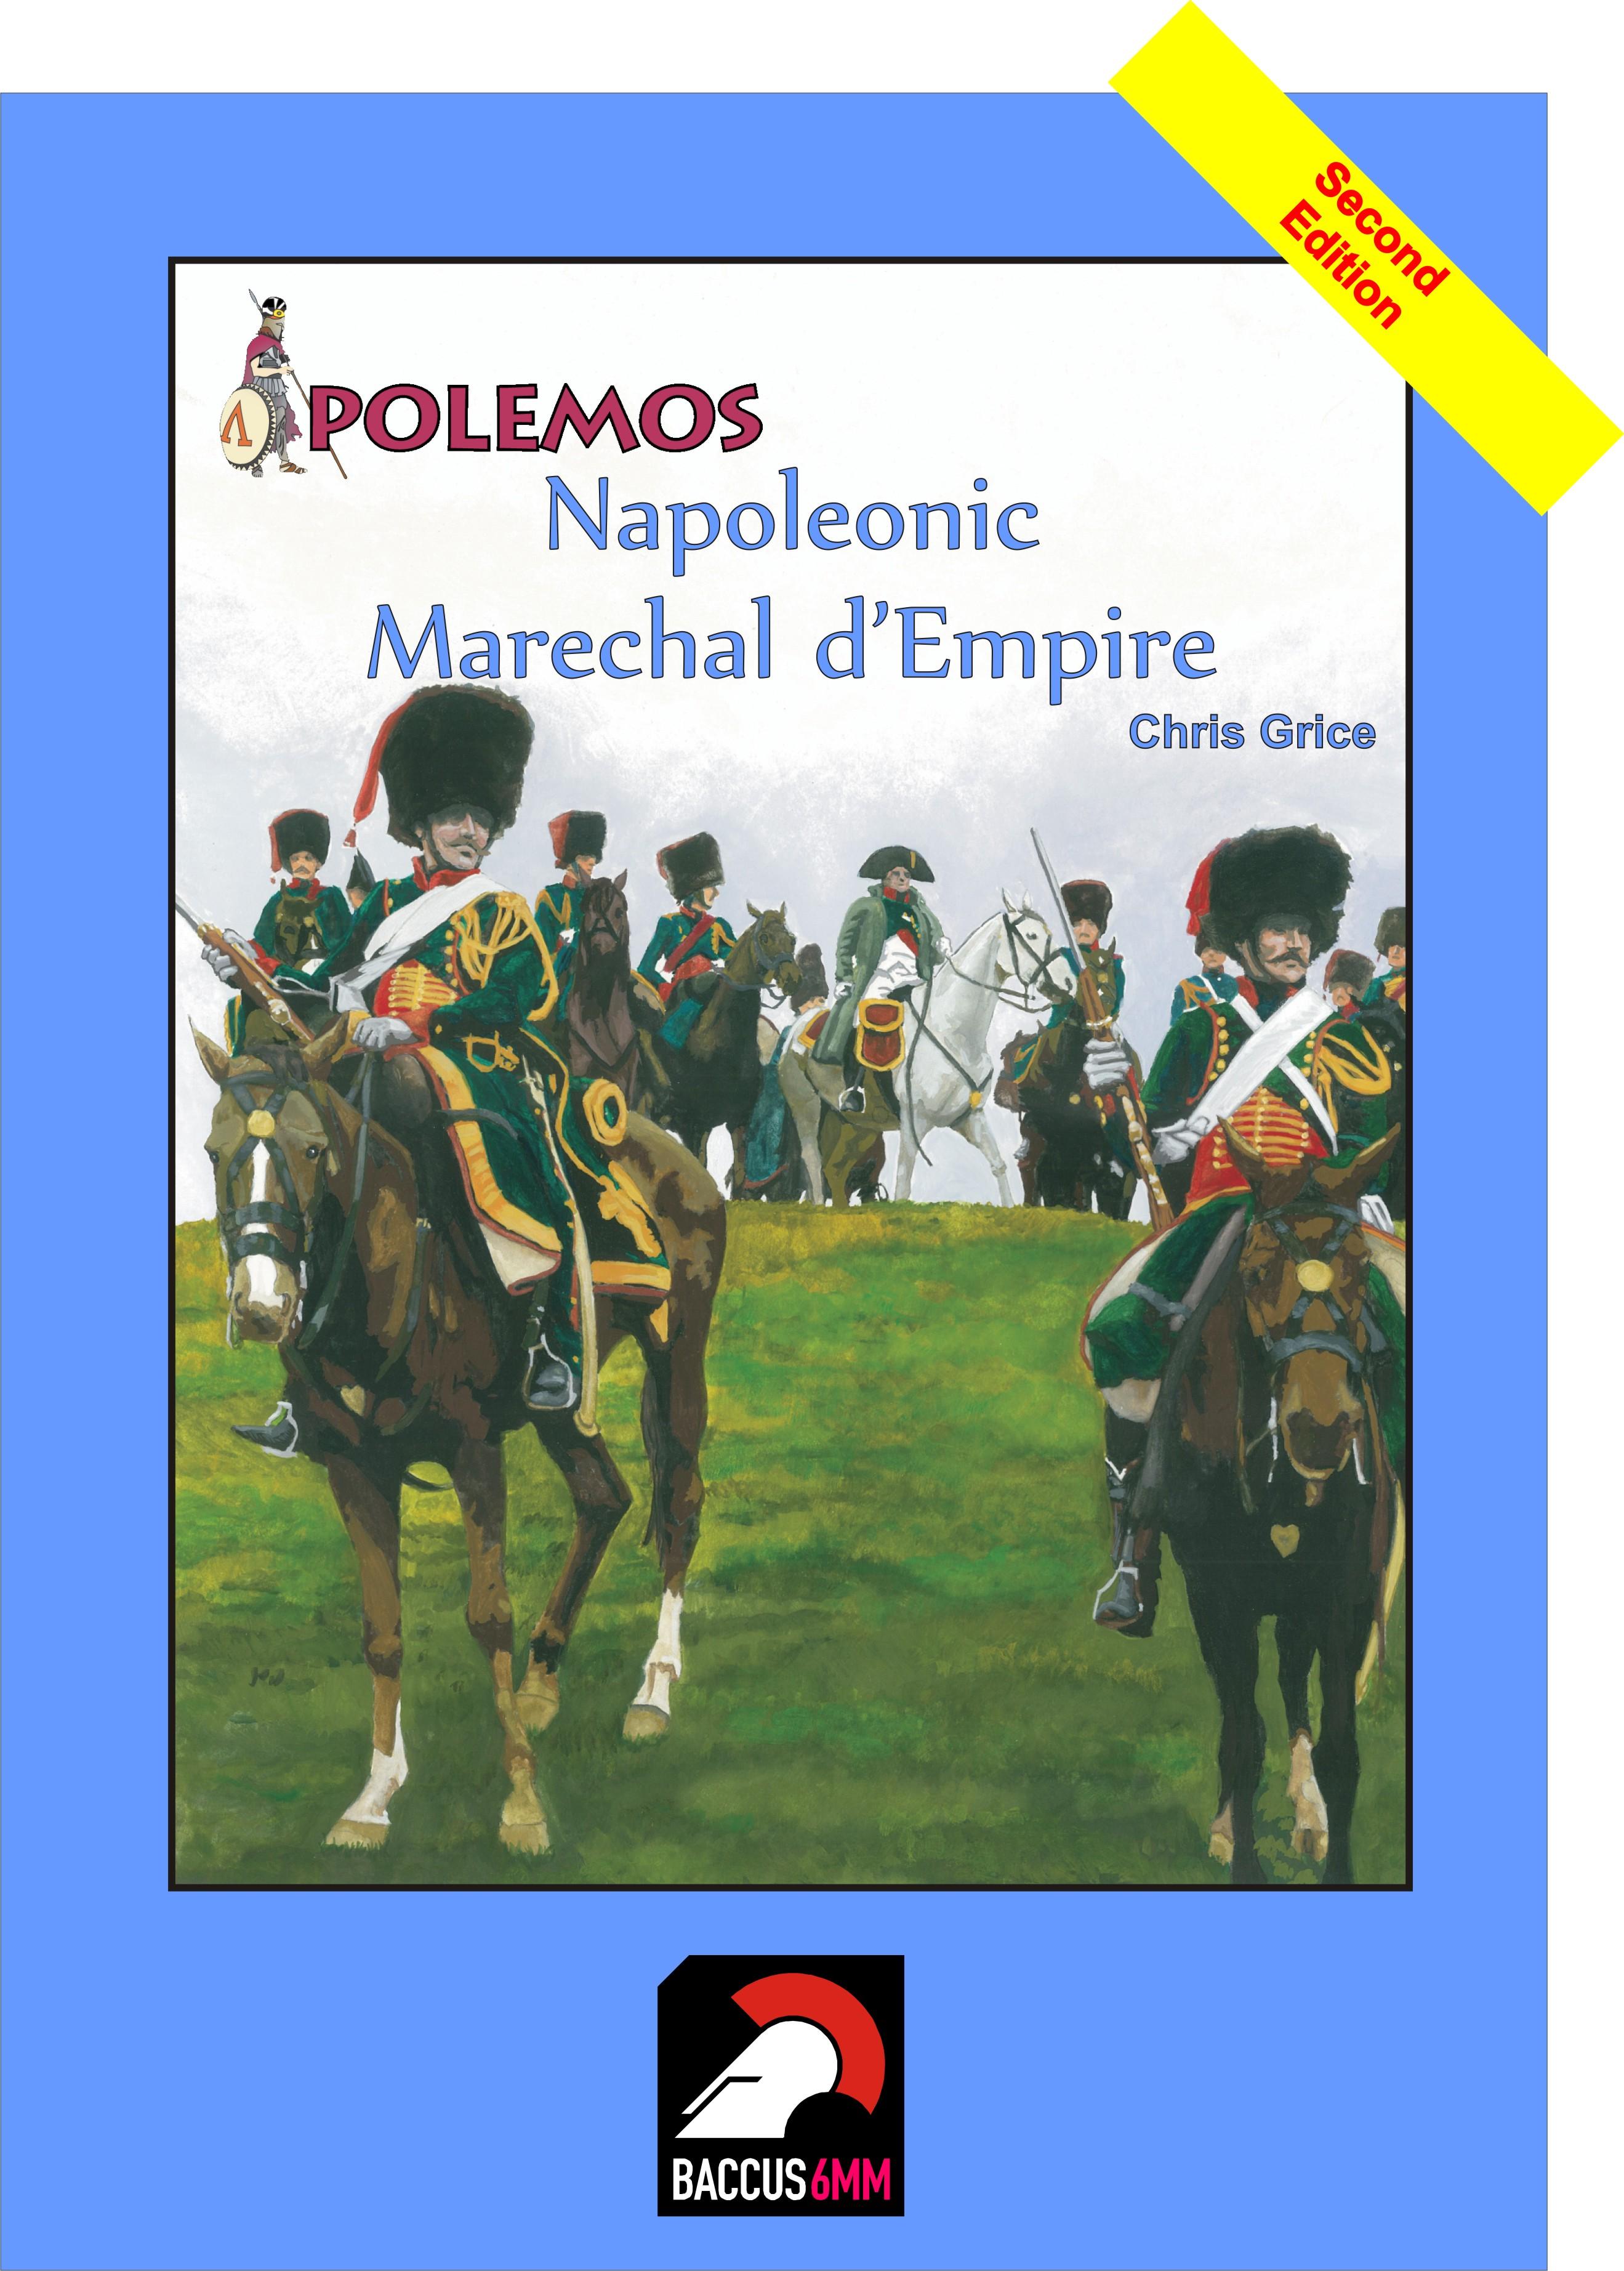 POLNAPRULES - Polemos Napoleonic rules